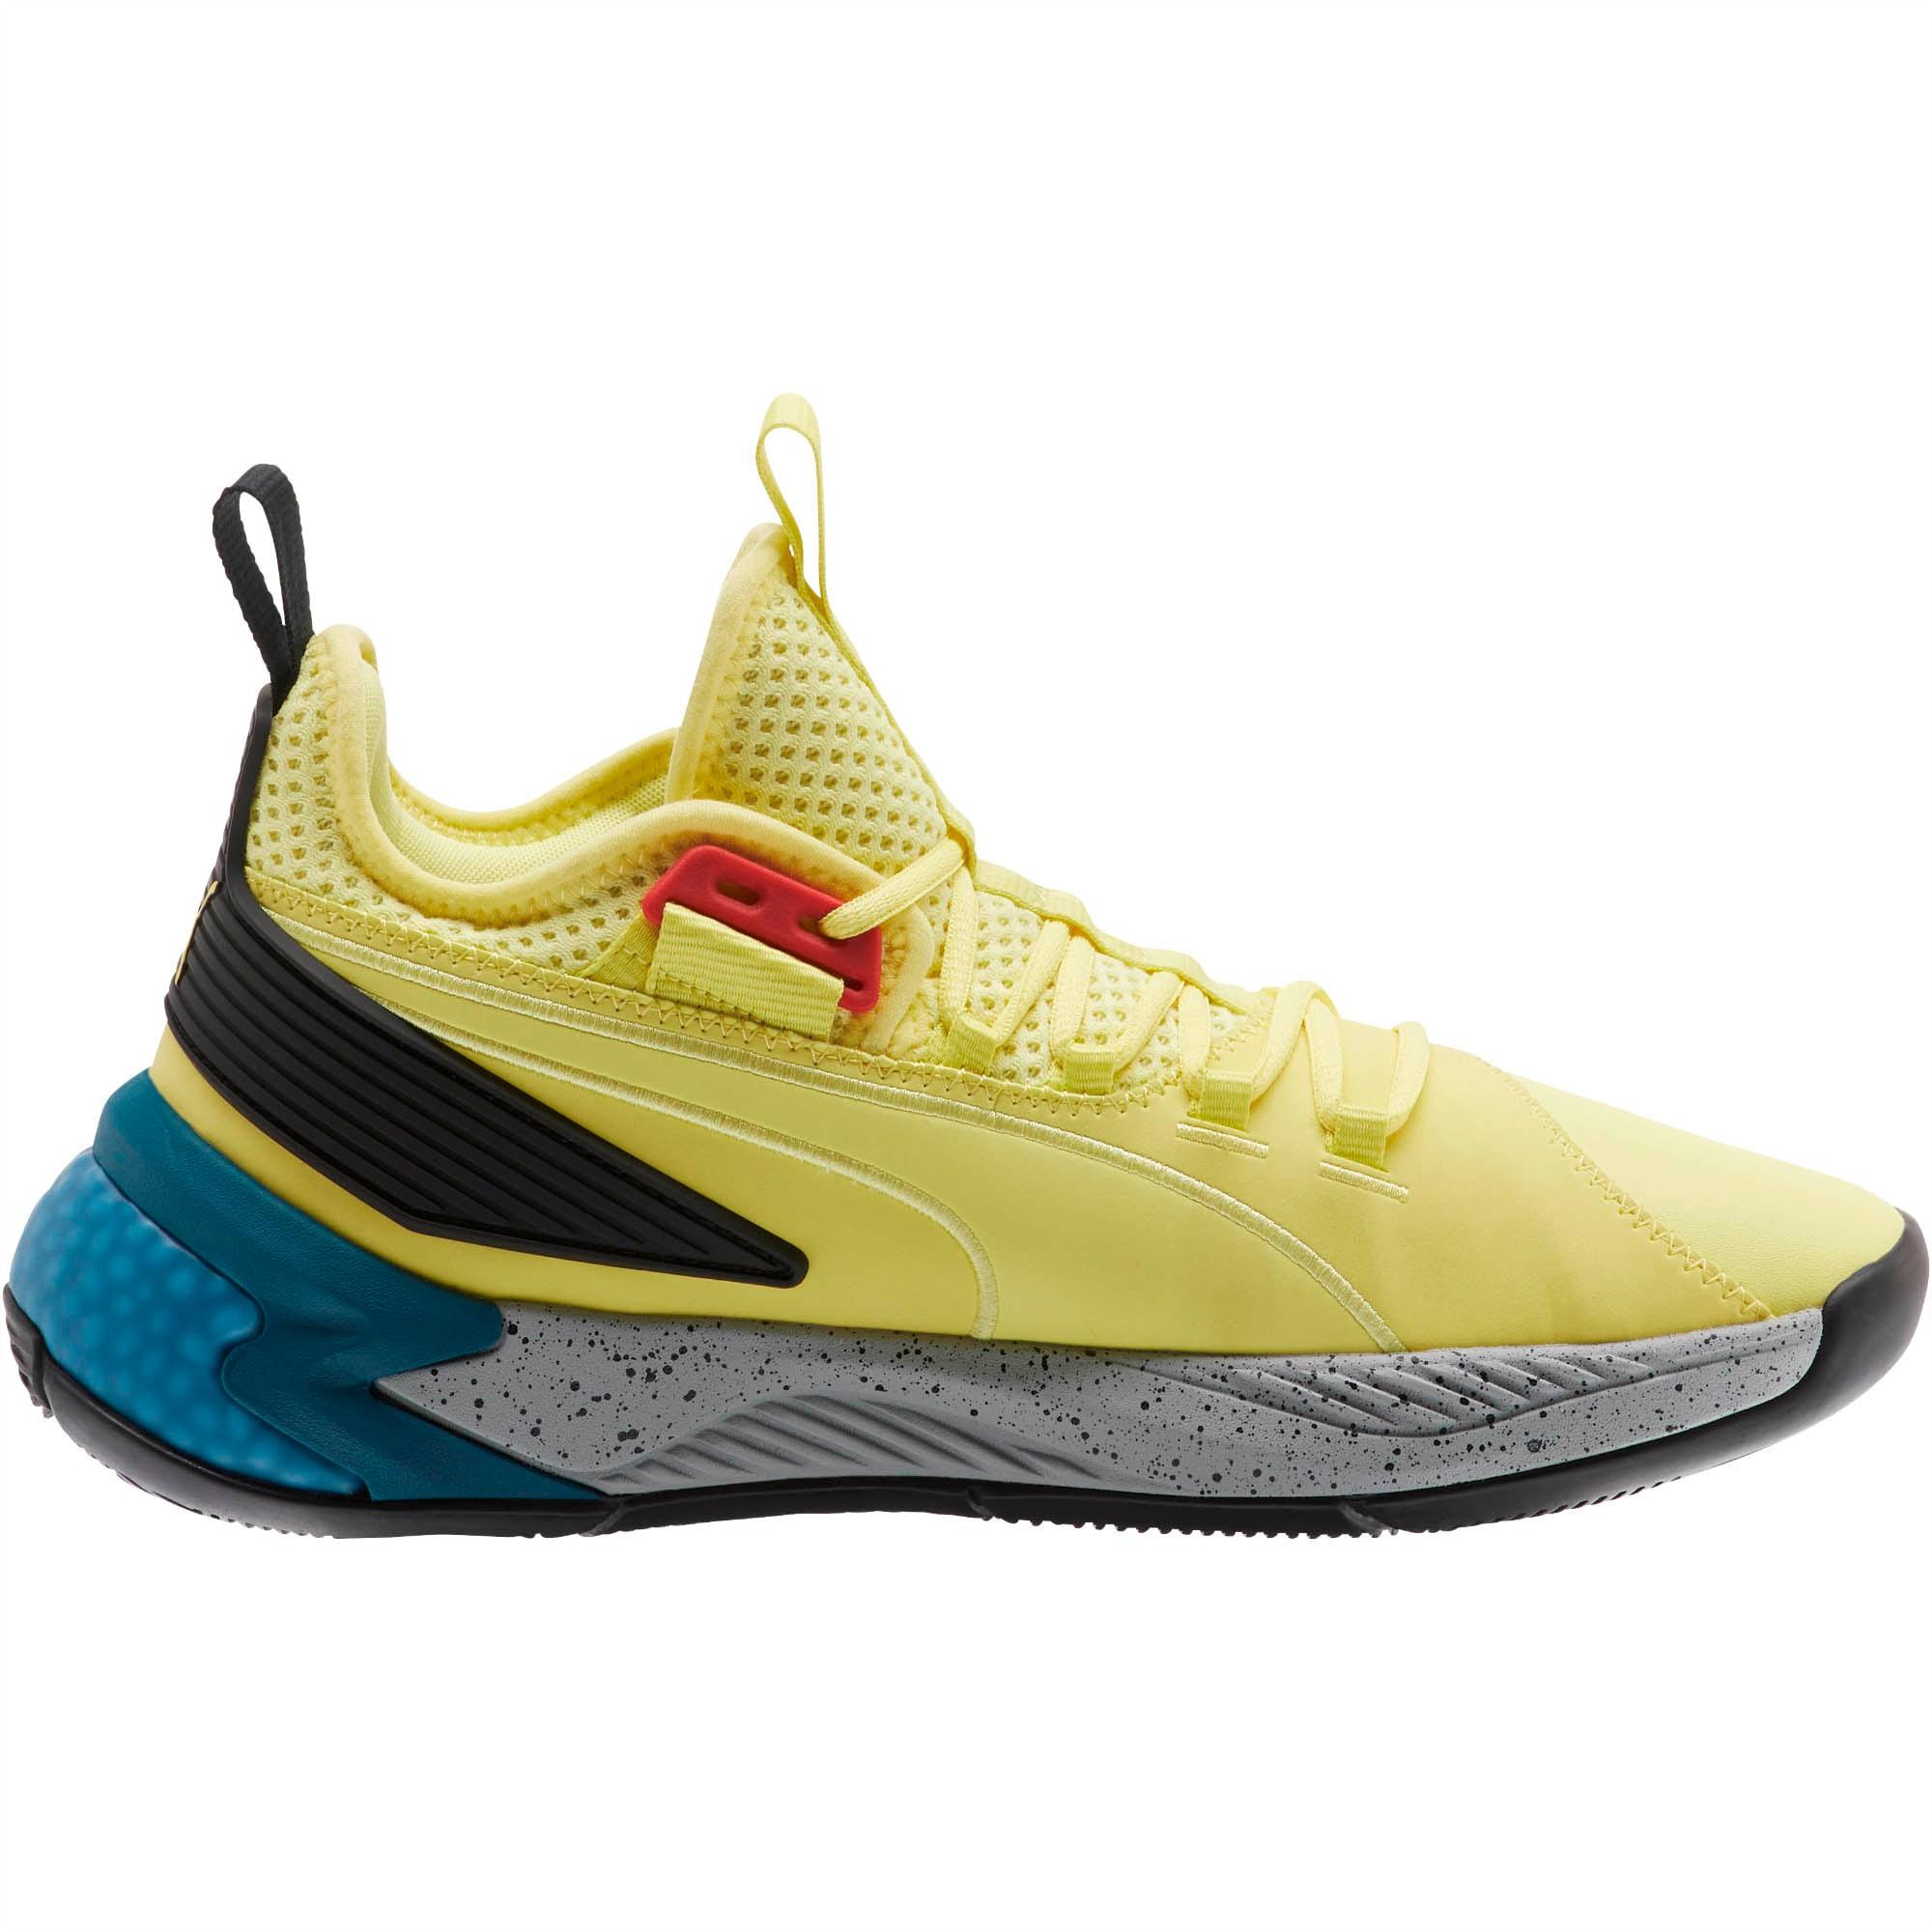 Uproar Spectra Basketball Shoes